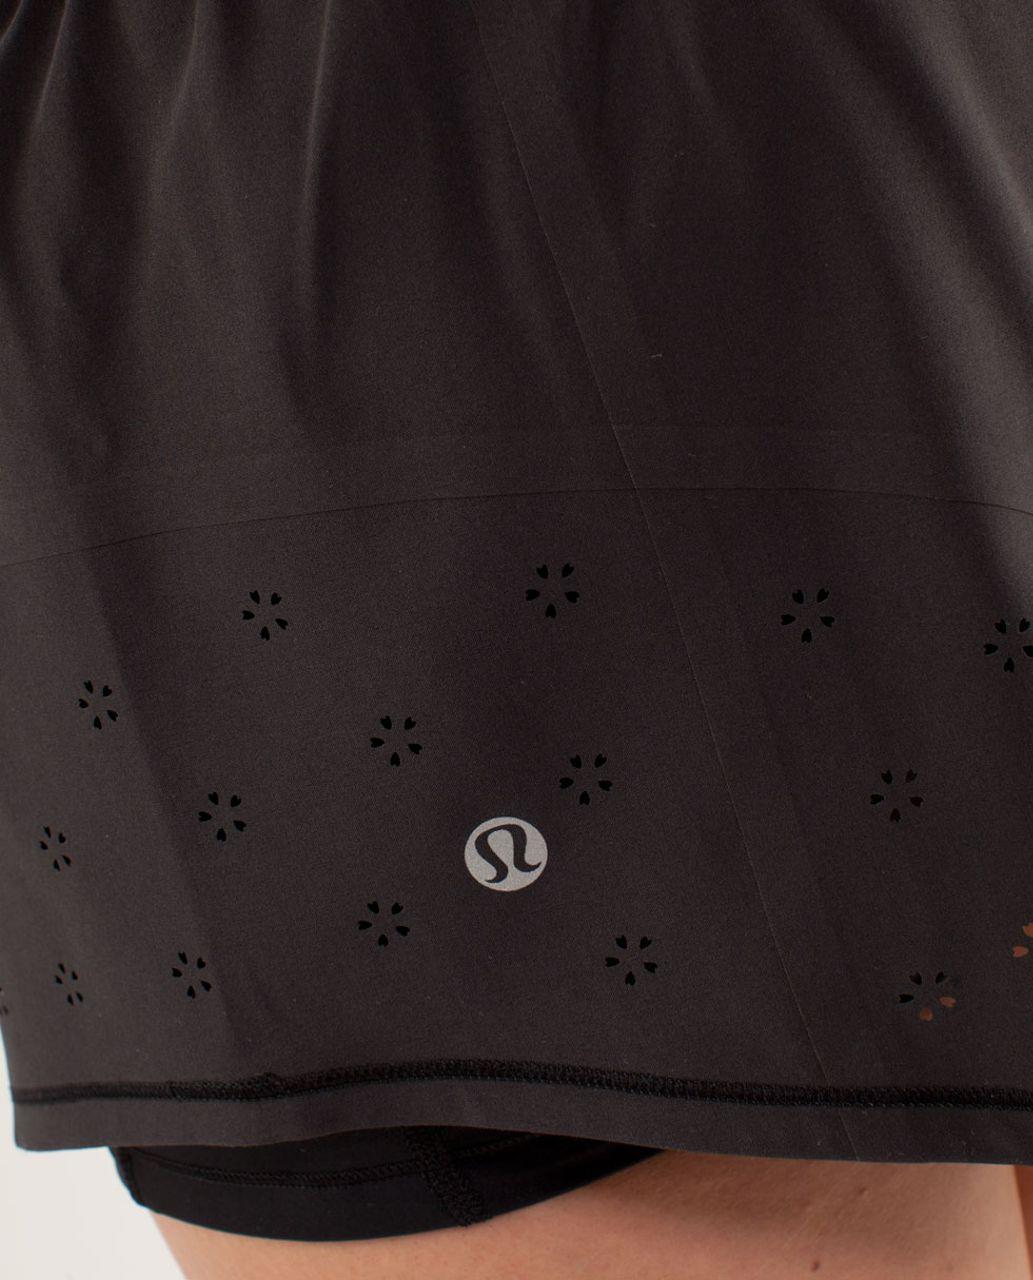 Lululemon Run:  Breeze By Skirt *Laser Cut - Black